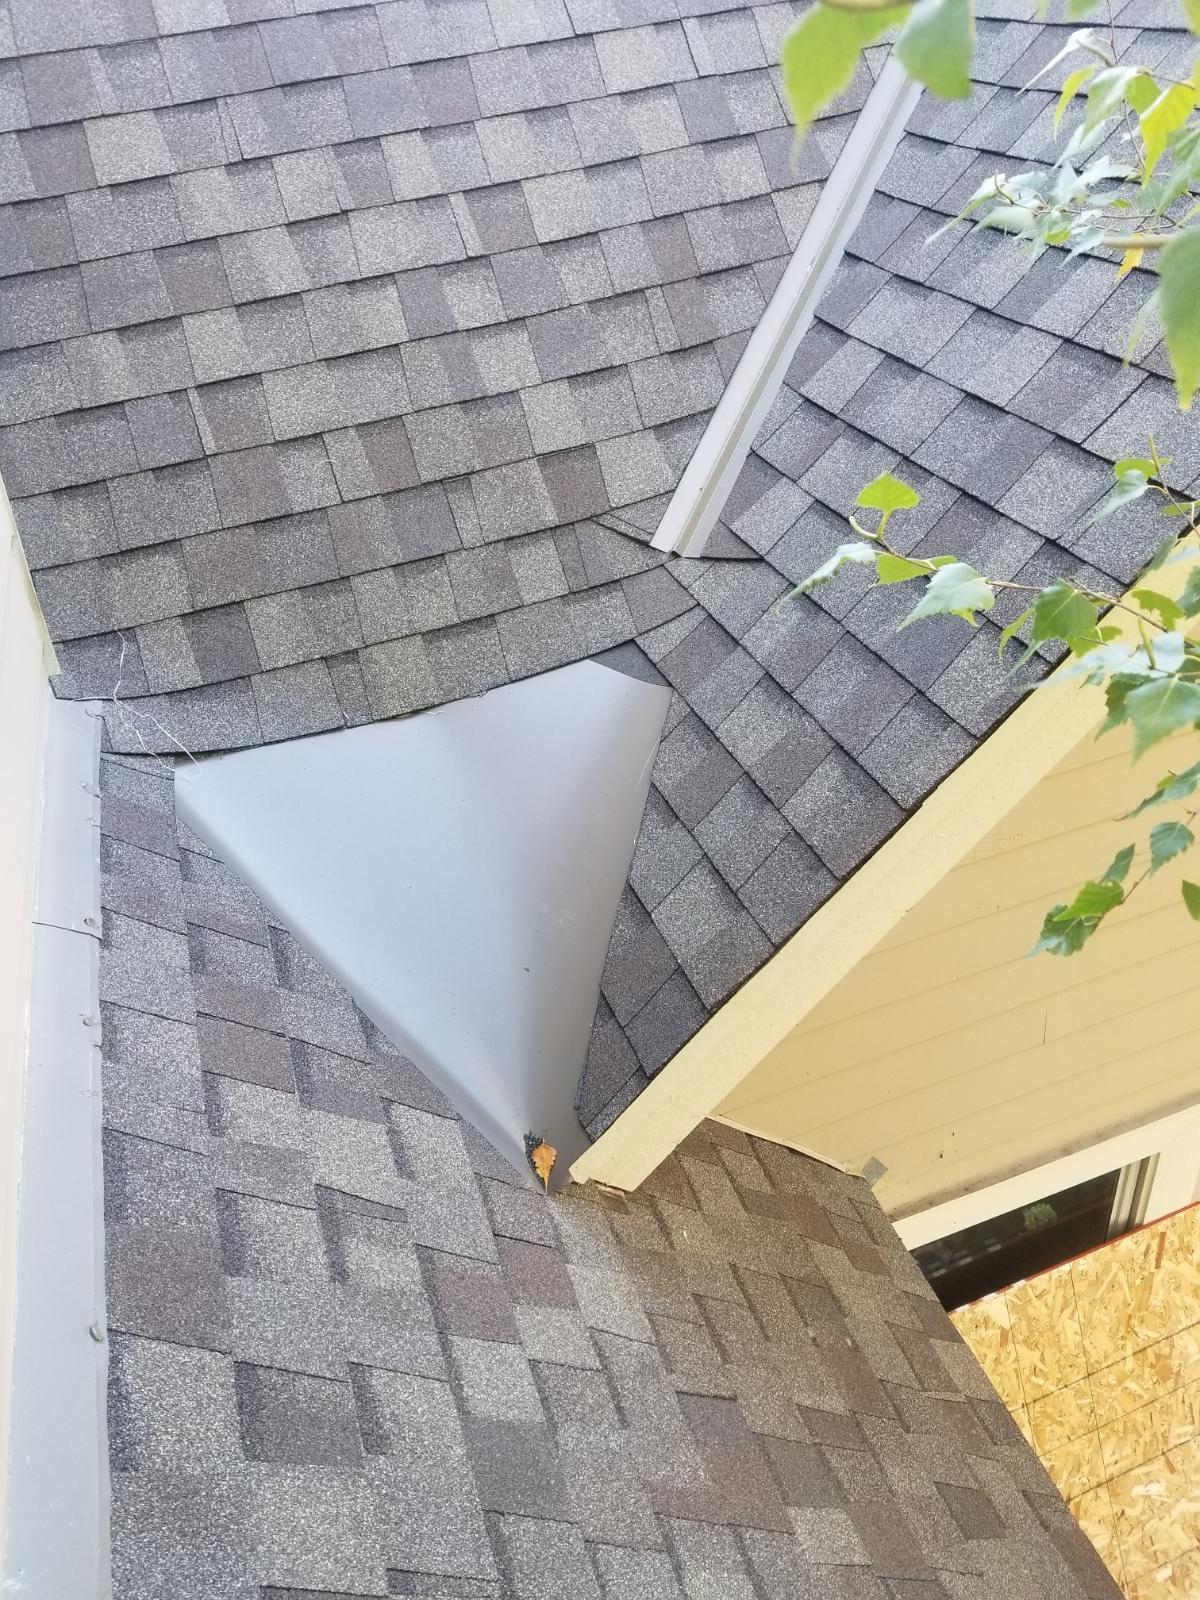 Wisconsin Roofing LLC | Residential | Elkhart Lake | Custom metal pan to divert water | water drainage issue | leak